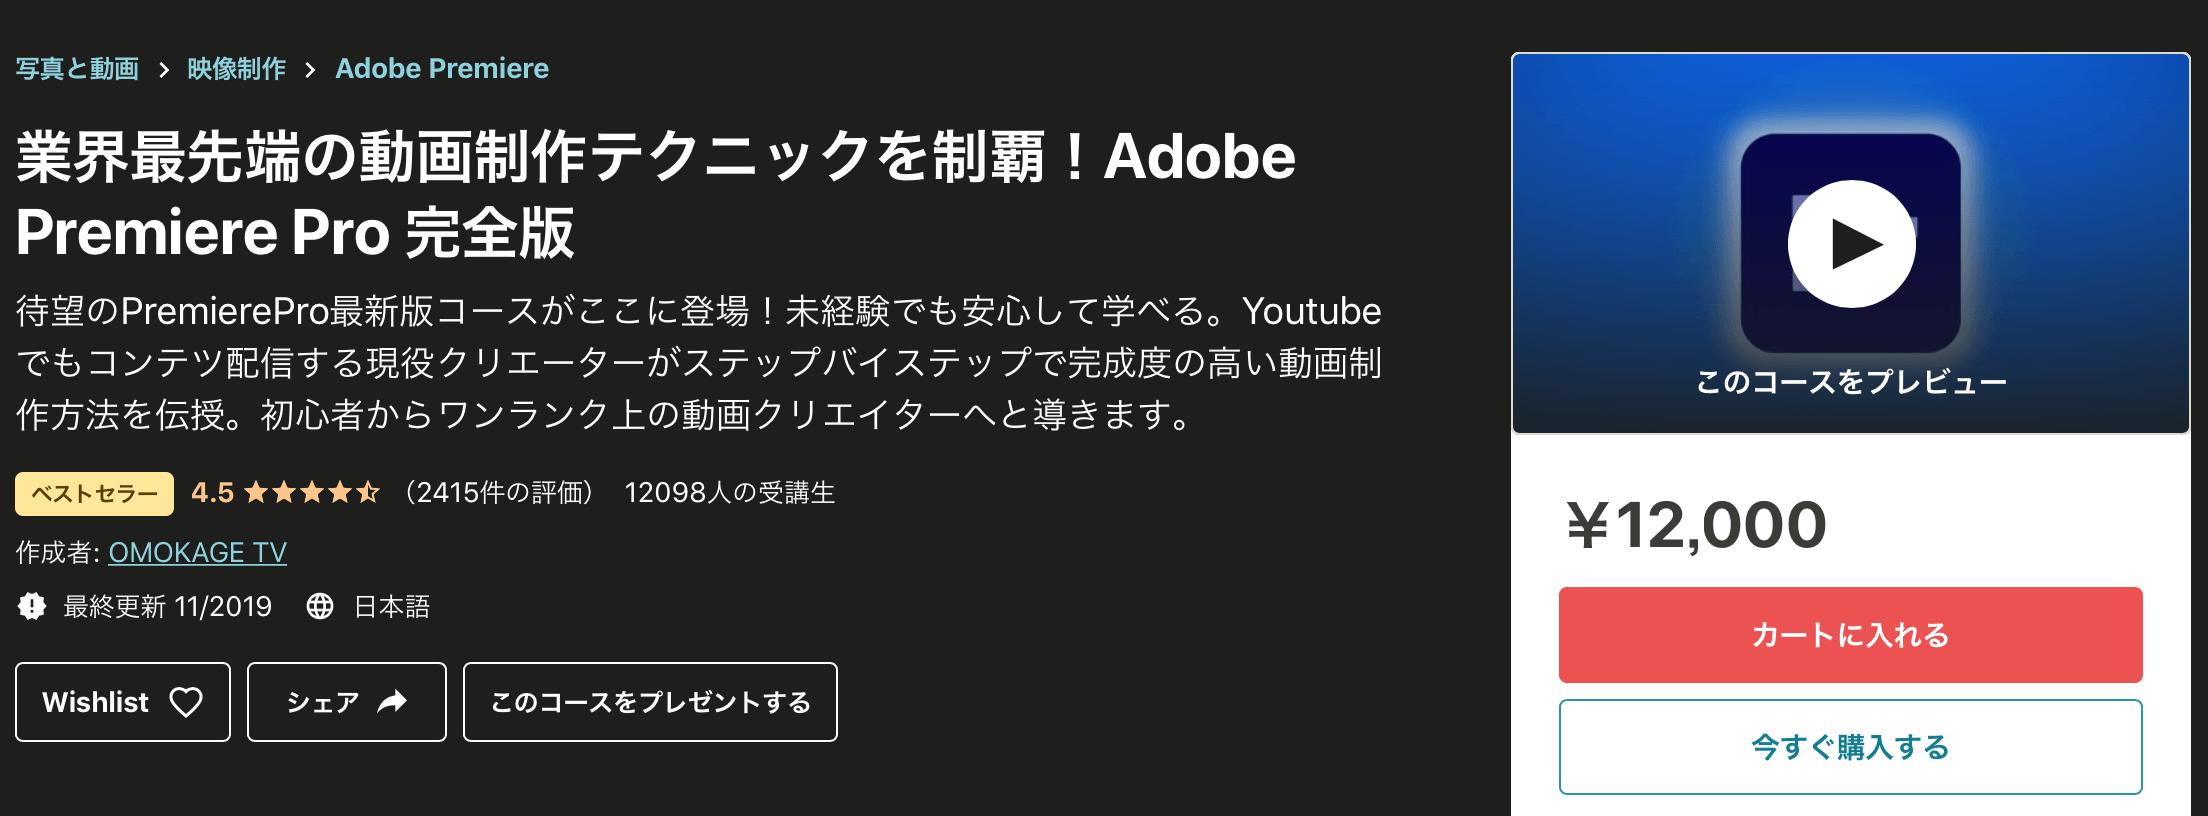 Adobe Premiere Proの学習におすすめの講座